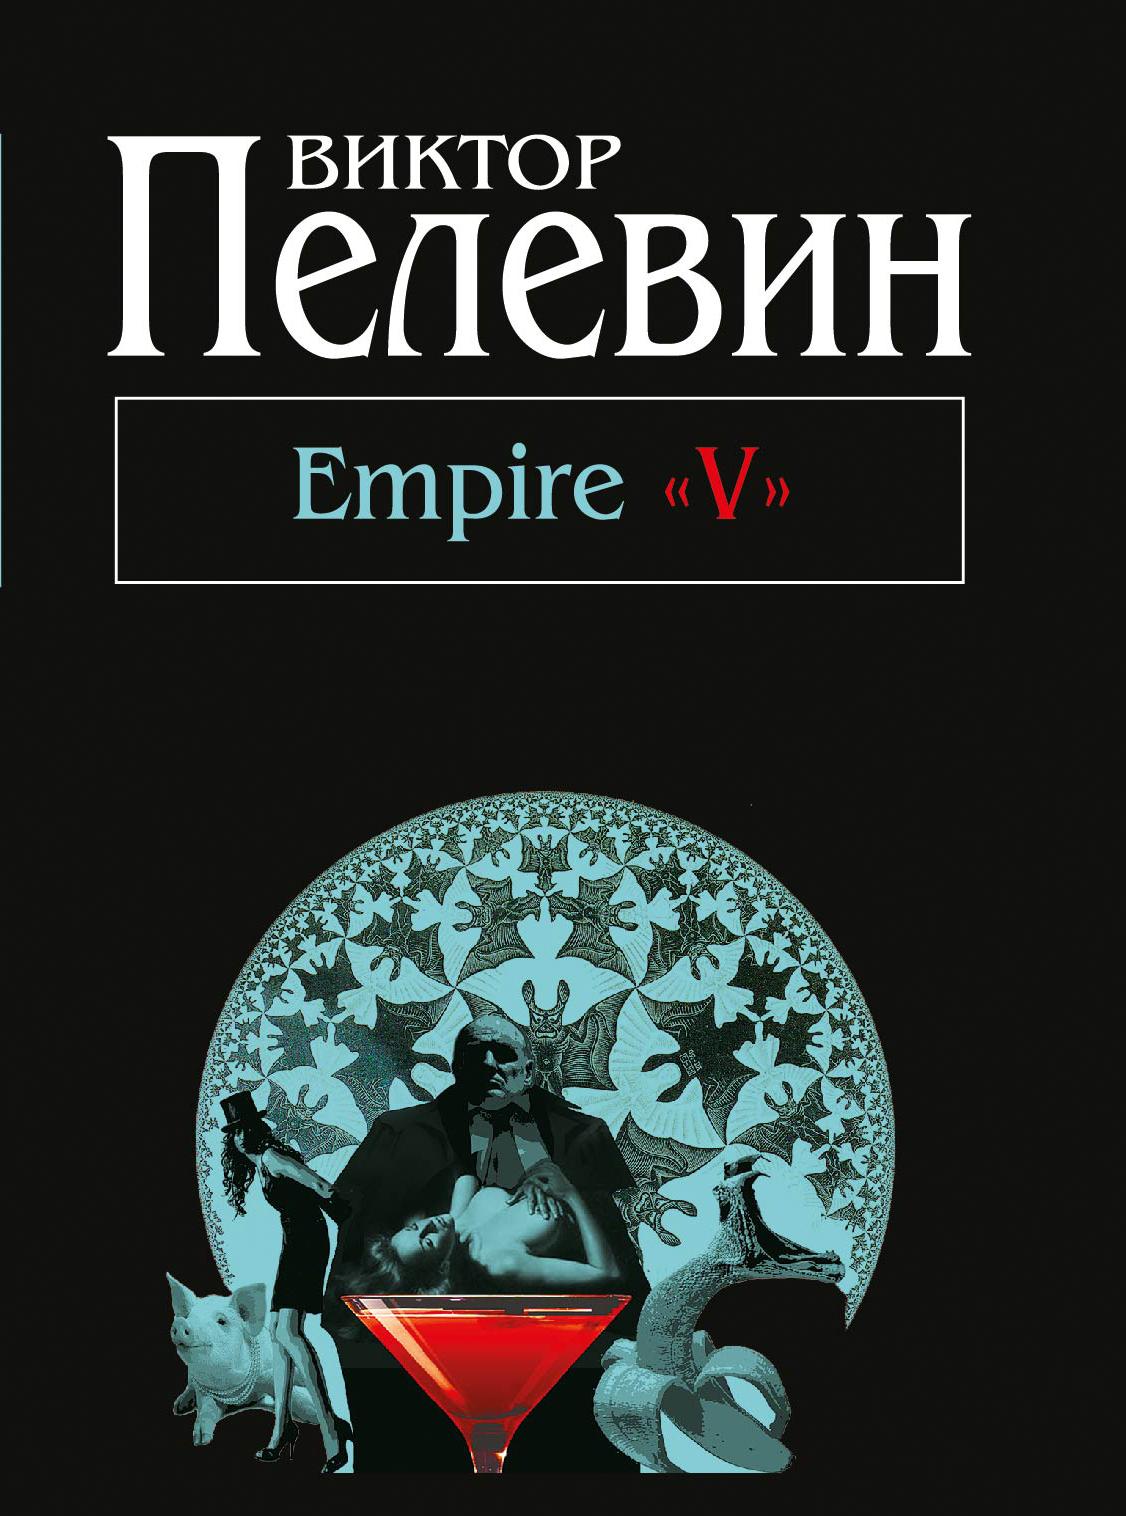 Виктор пелевин empire v цитаты